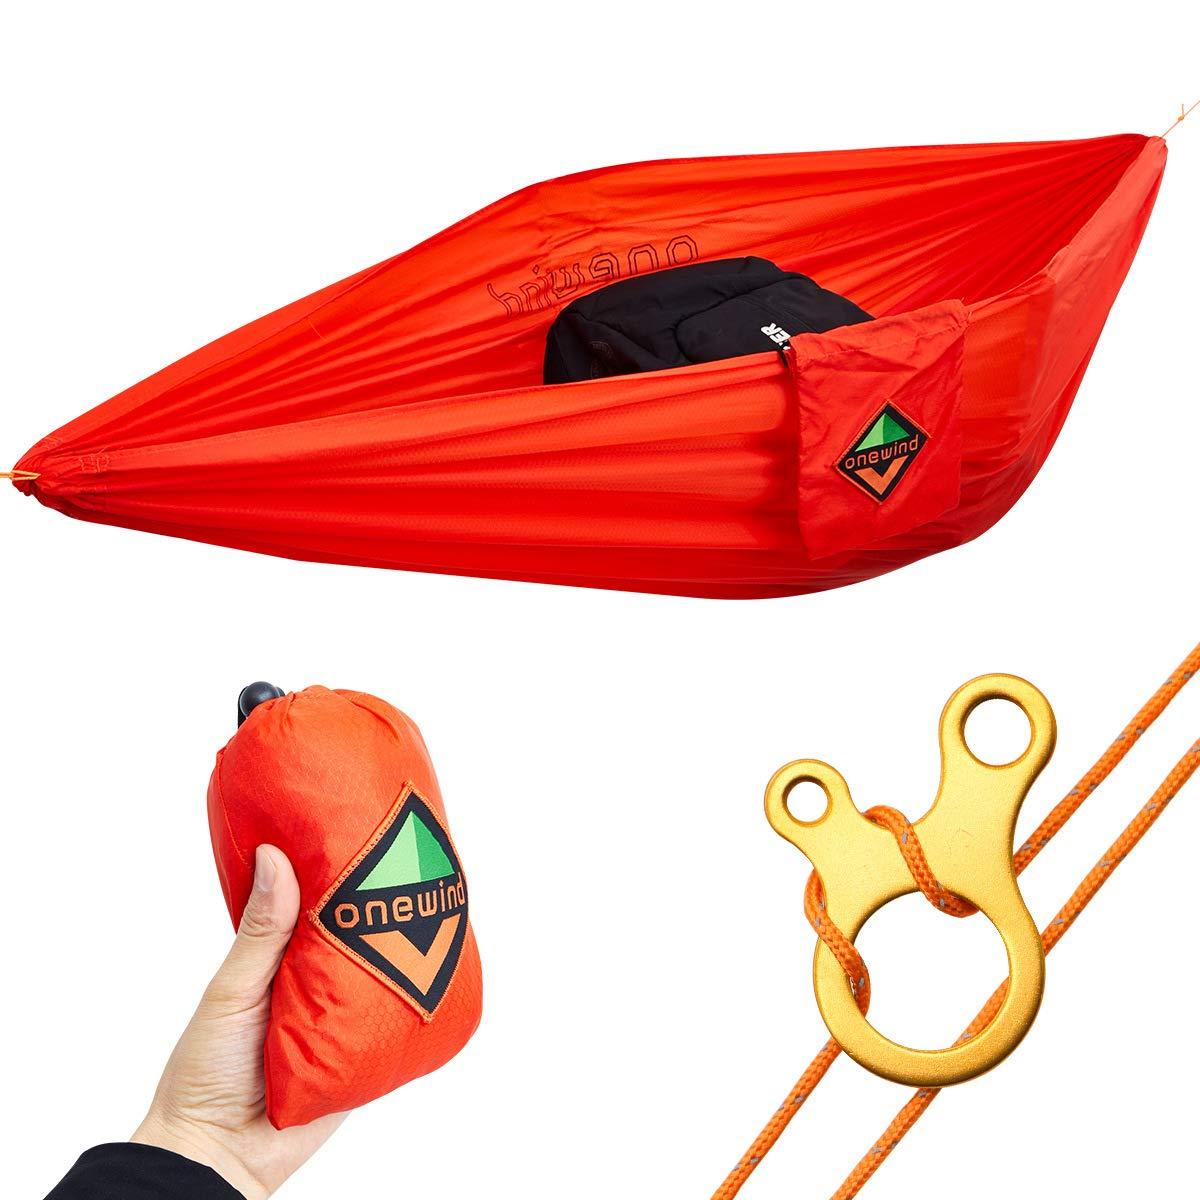 onewind Gear Hammock Mini Storage Camping Accessories Hammock Portable Outfitters Underbelly Gear Sling Hammock…